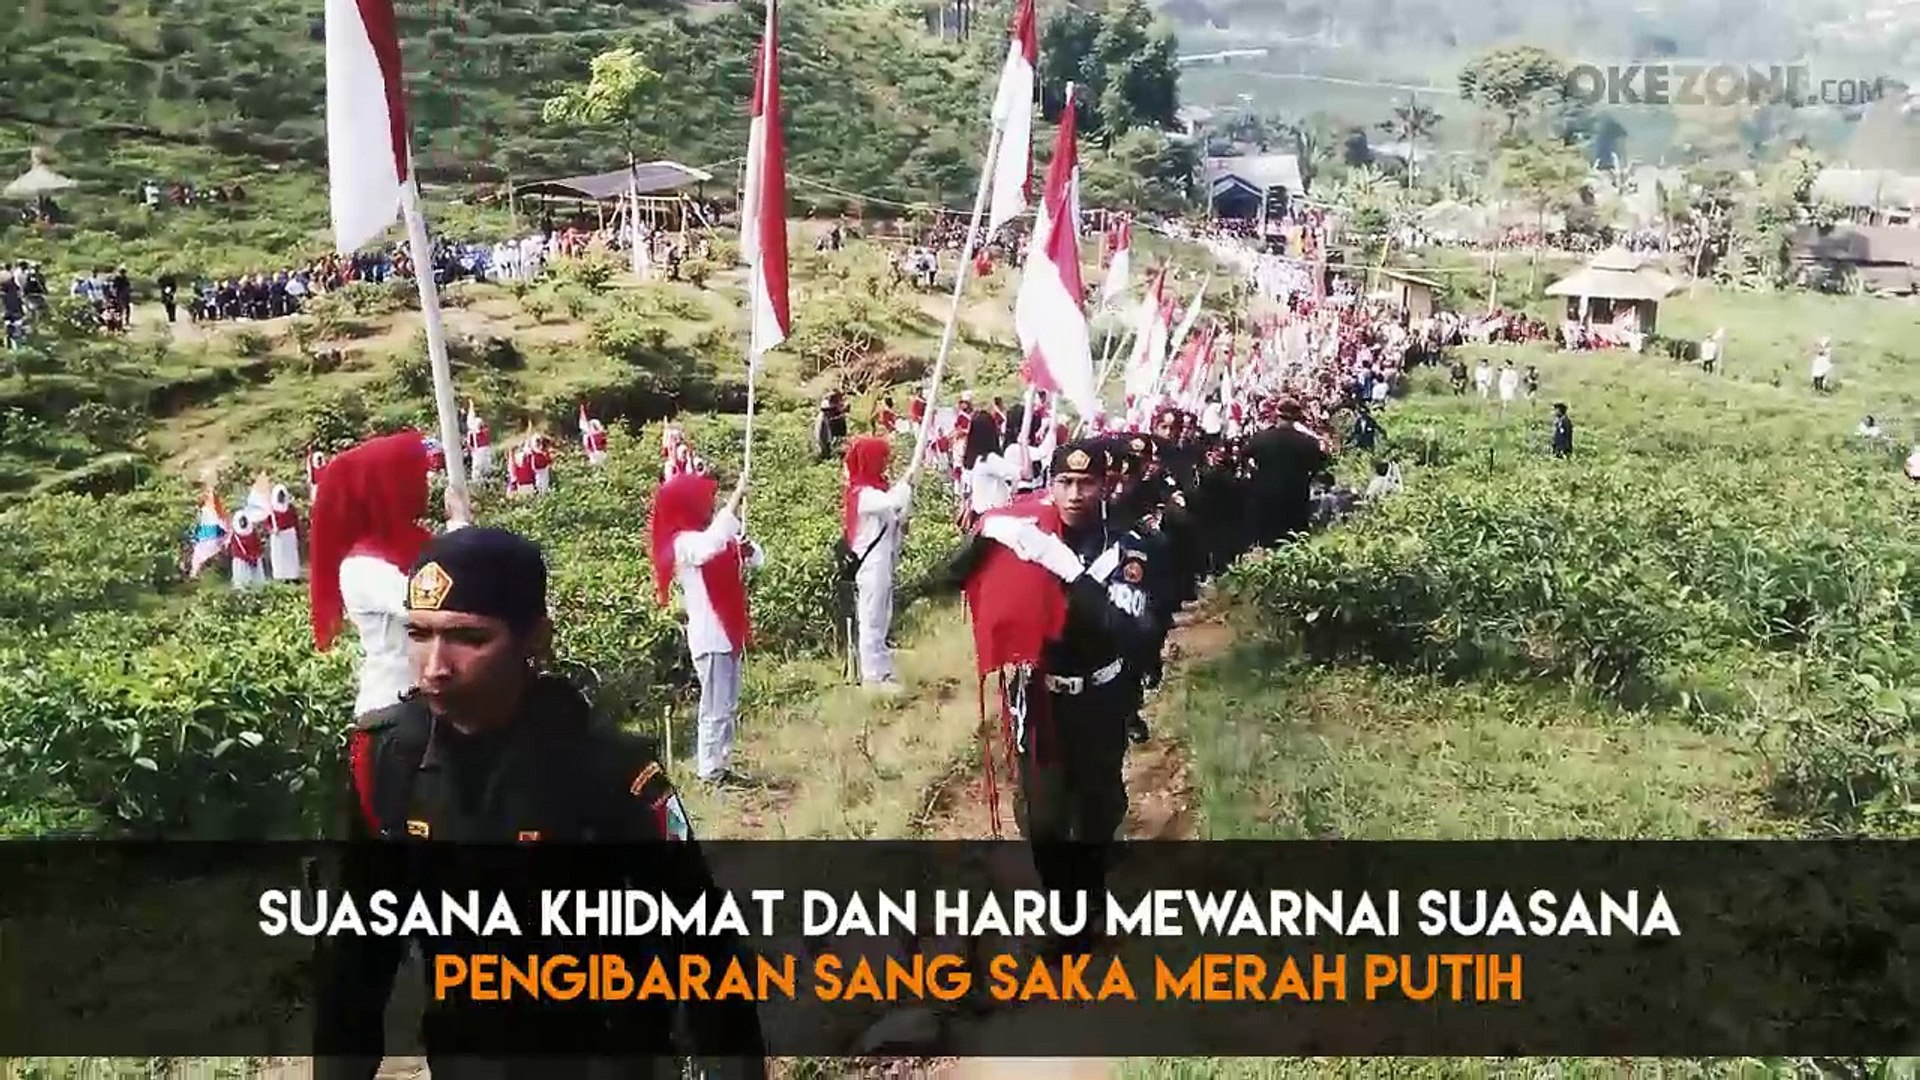 Pengibaran Bendera Raksasa Di Lereng Gunung Lawu Video Dailymotion